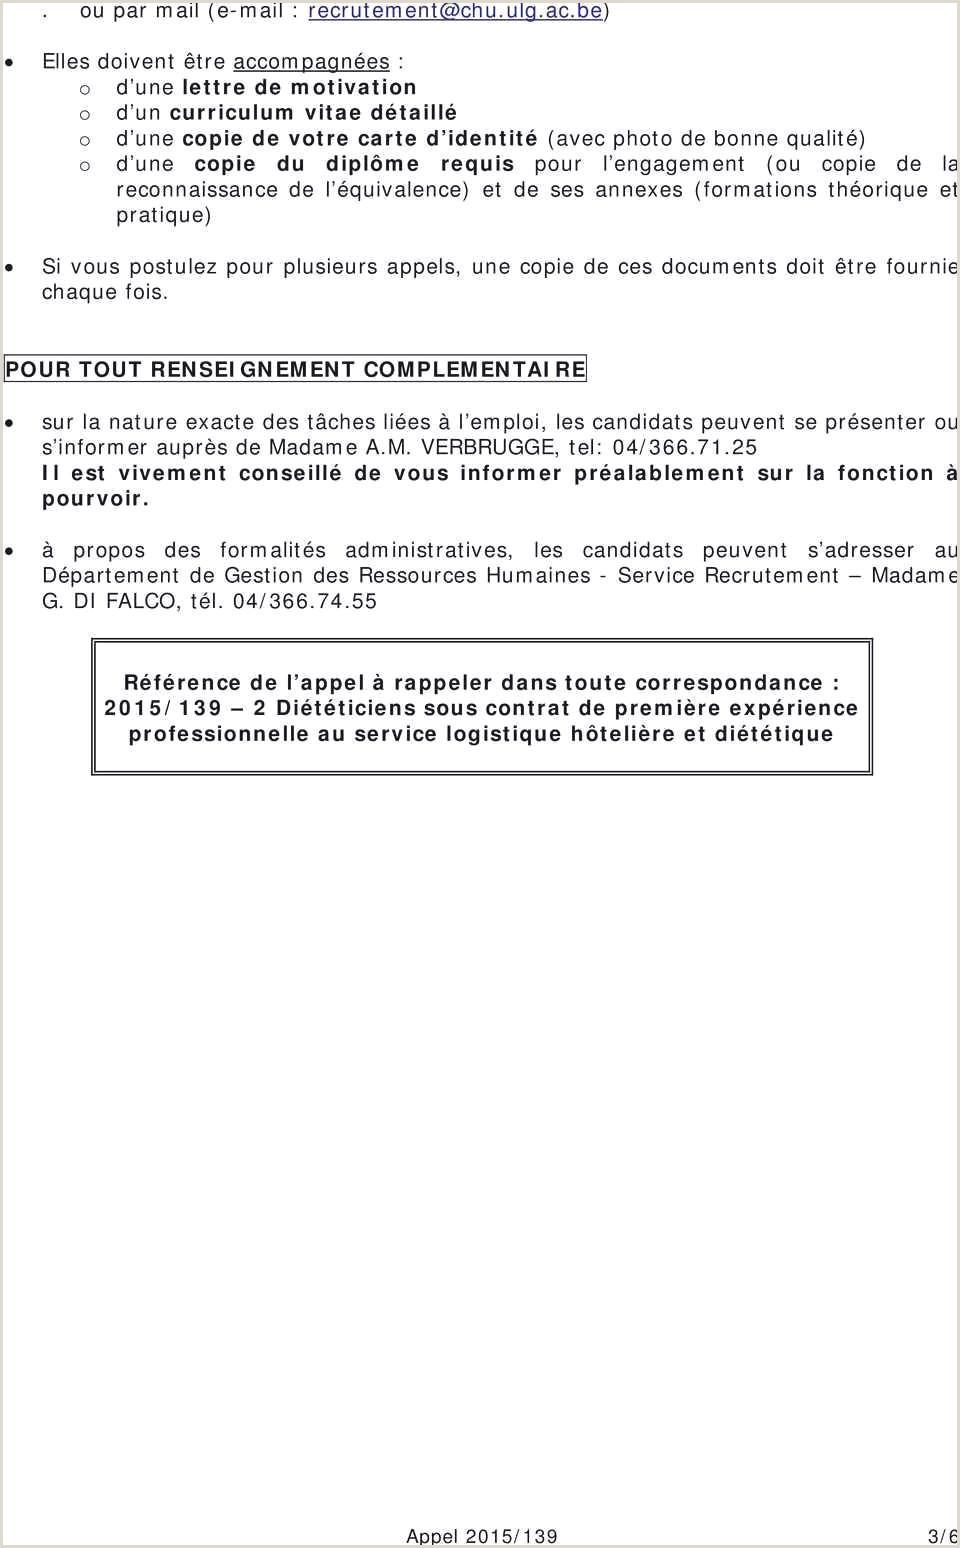 Telecharger Un Exemple De Cv Collections De Curriculum Vitae